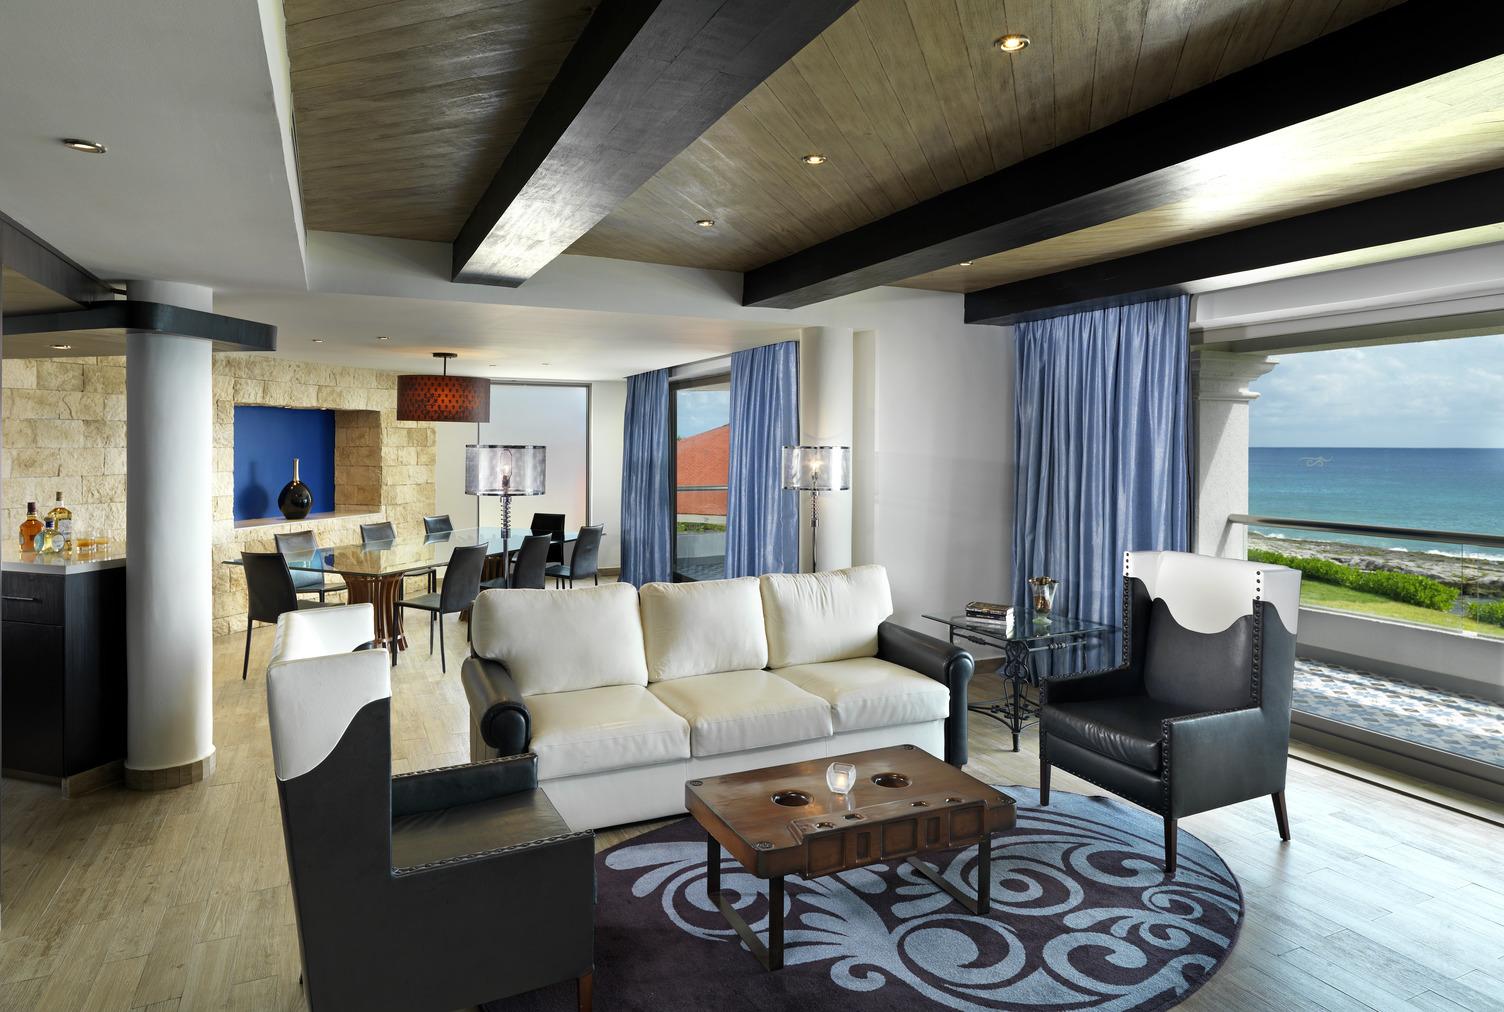 Travel Agency All-Inclusive Resort Heaven at Hard Rock Hotel Riviera Maya 39